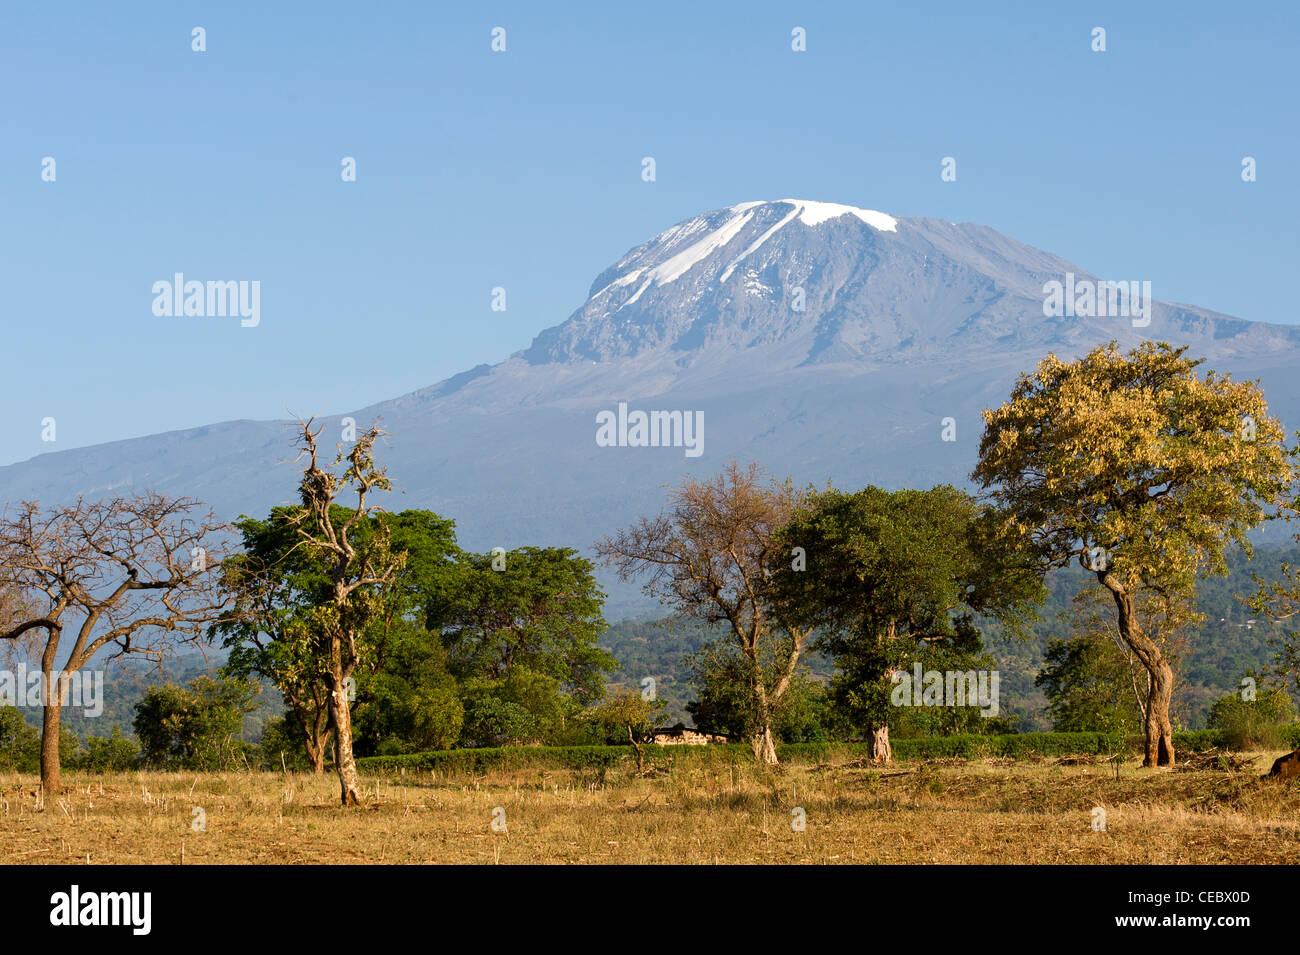 Kilimanjaro and agricultural land during dry season as seen from Moshi Tanzania - Stock Image